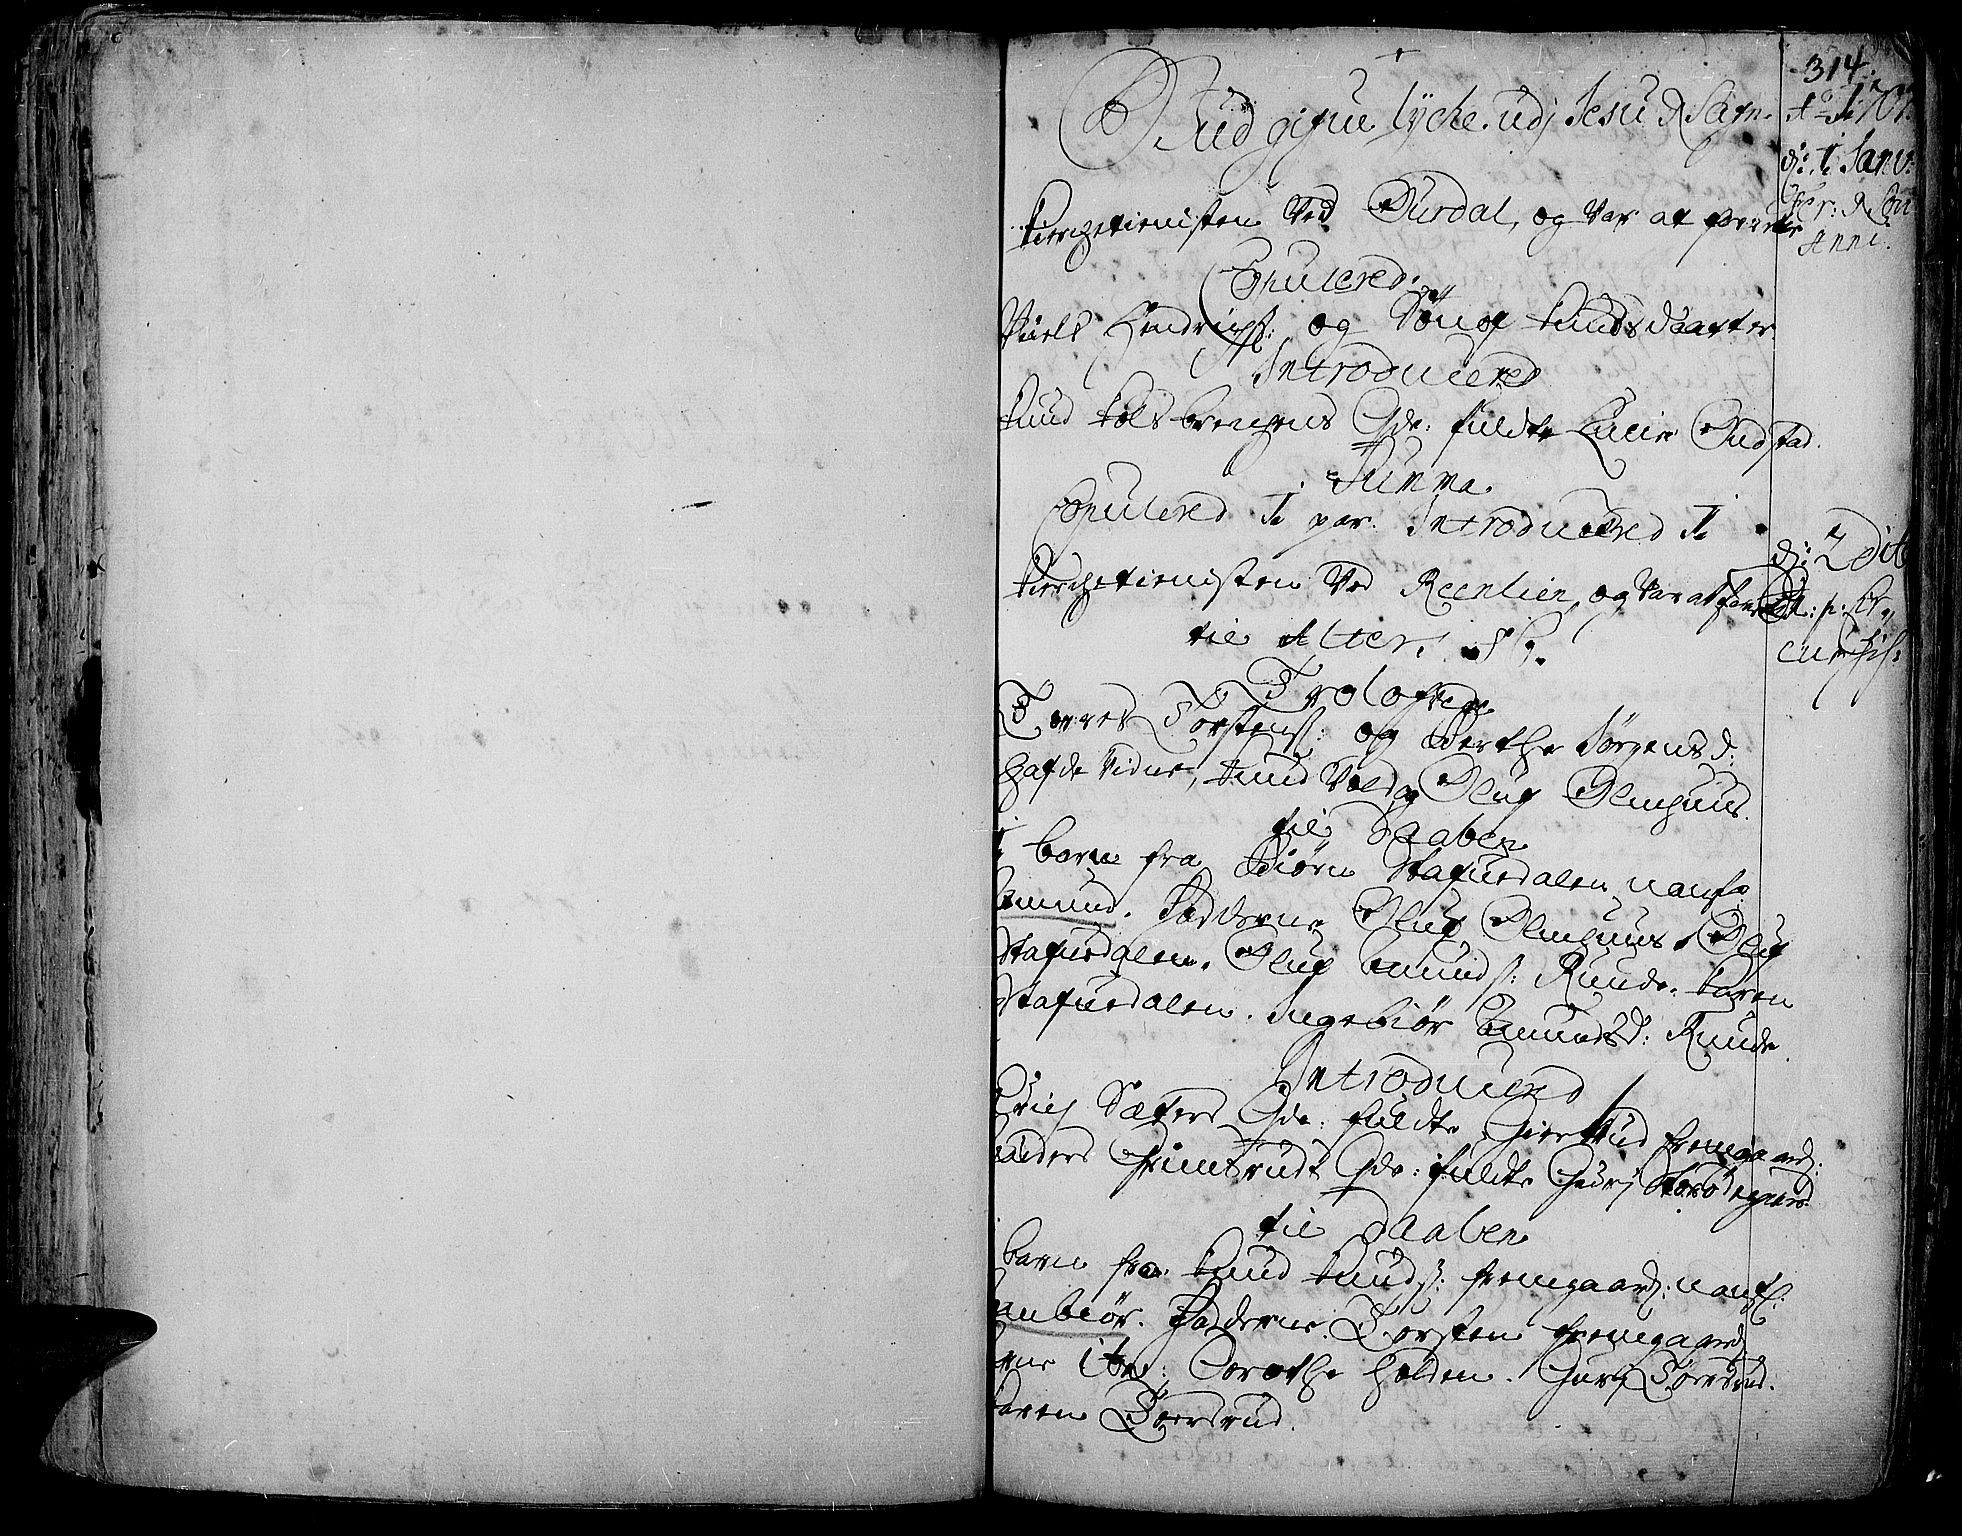 SAH, Aurdal prestekontor, Ministerialbok nr. 1-3, 1692-1730, s. 314